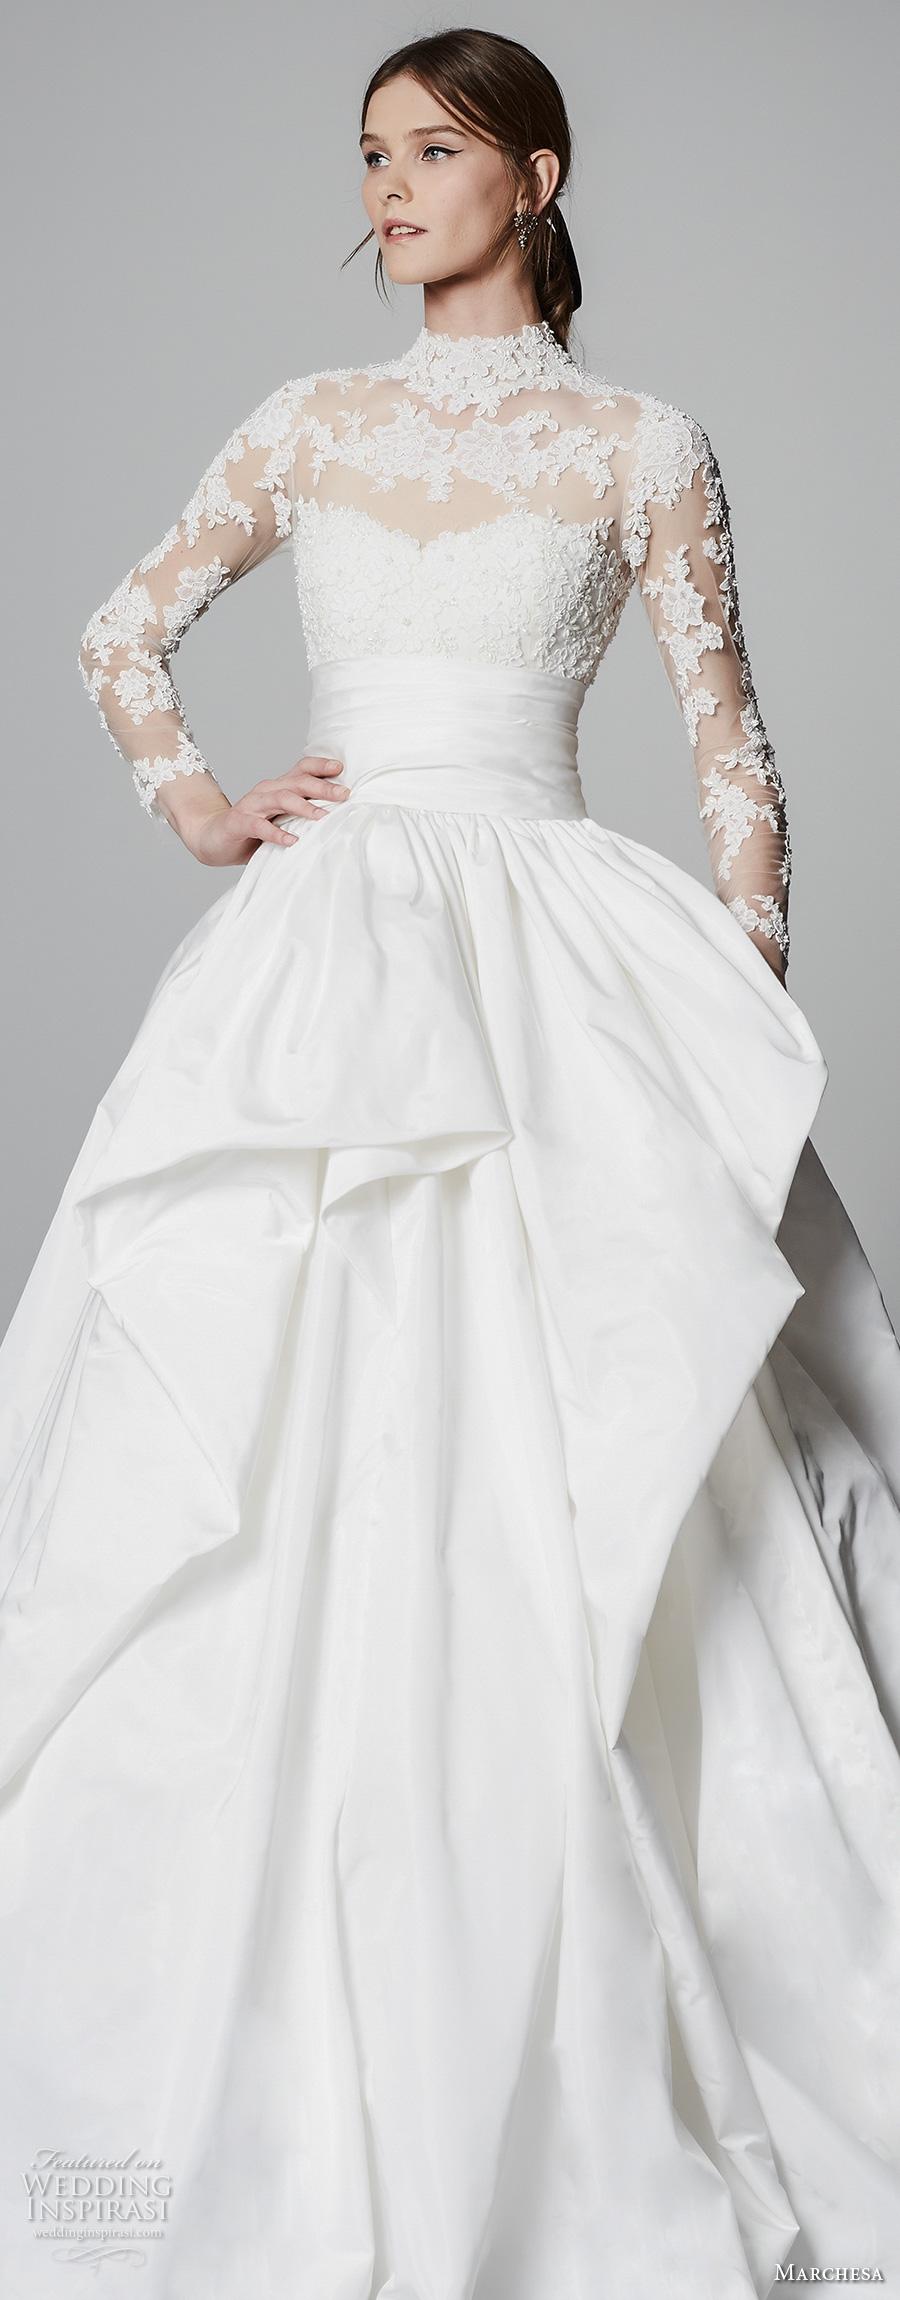 Fullsize Of Marchesa Wedding Dress